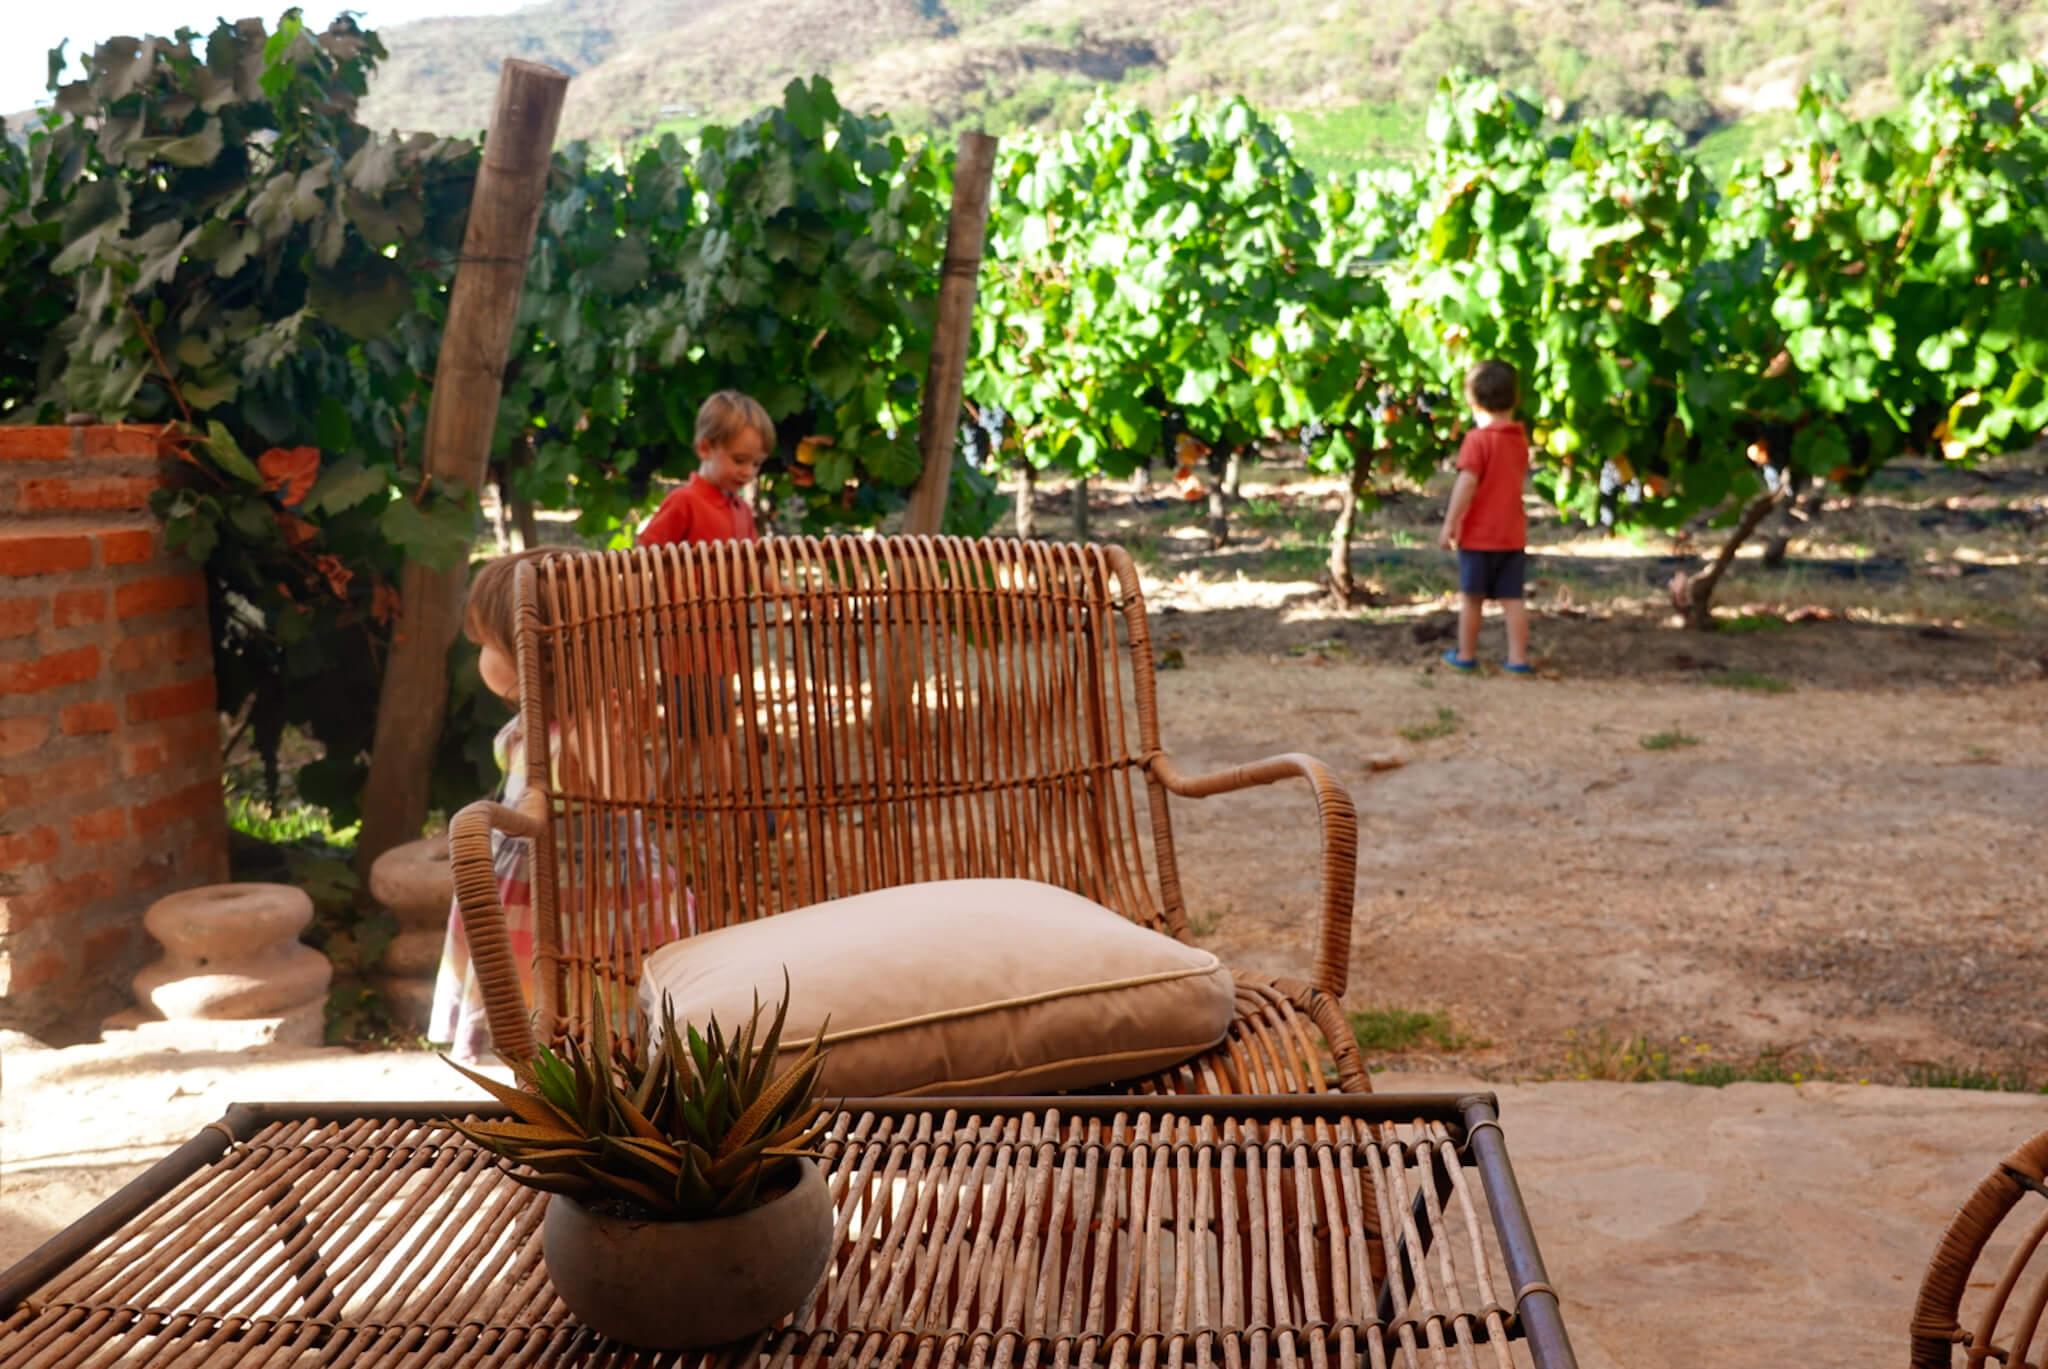 Santa Cruz winery, Chile